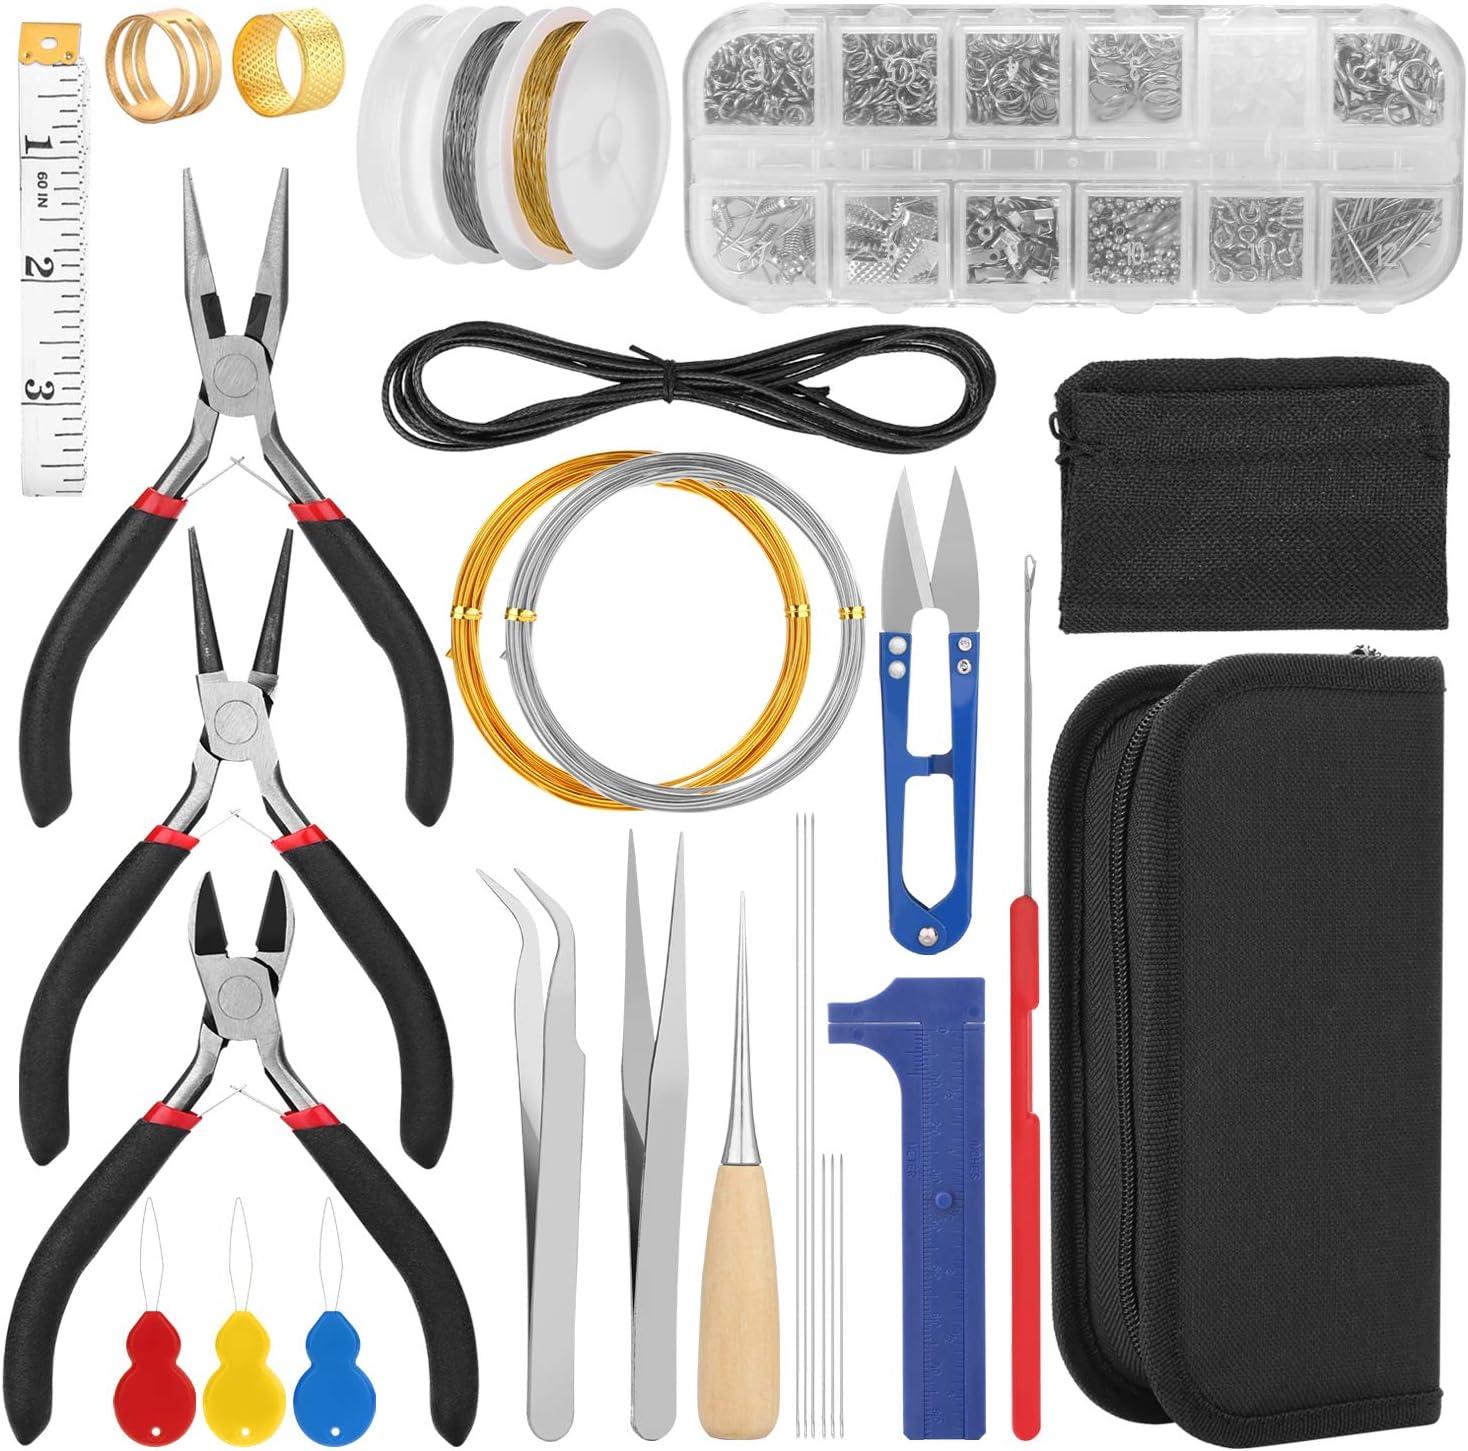 Earring Making Kit Earring Making Supplies Repair Kit Leather Earring Making Supplies Kit Earring Hooks Earring Jump Rings Earring Repair